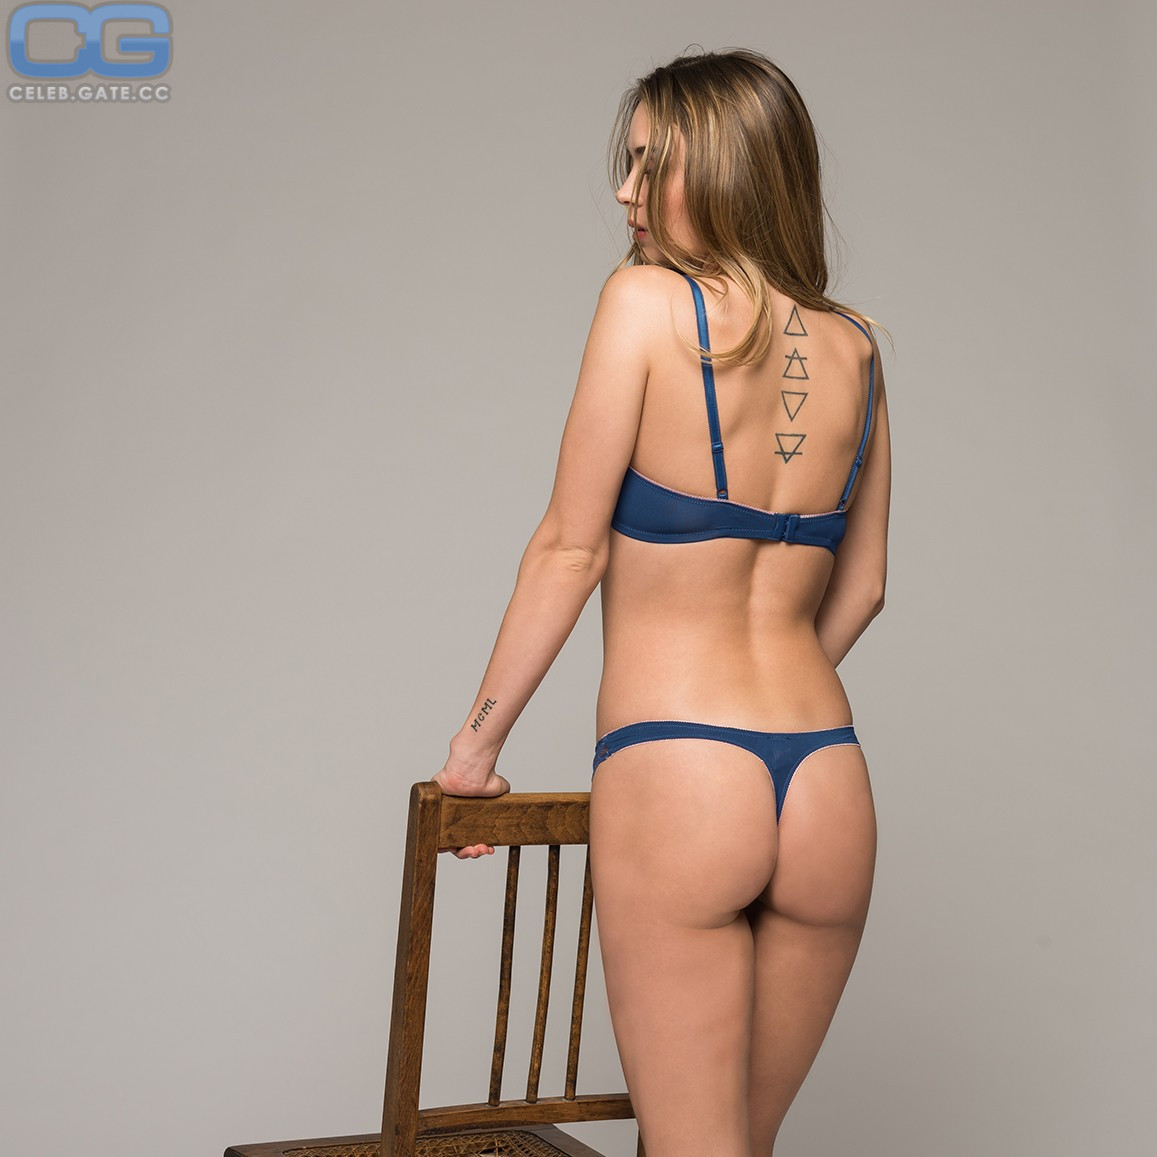 Greta faeser nude